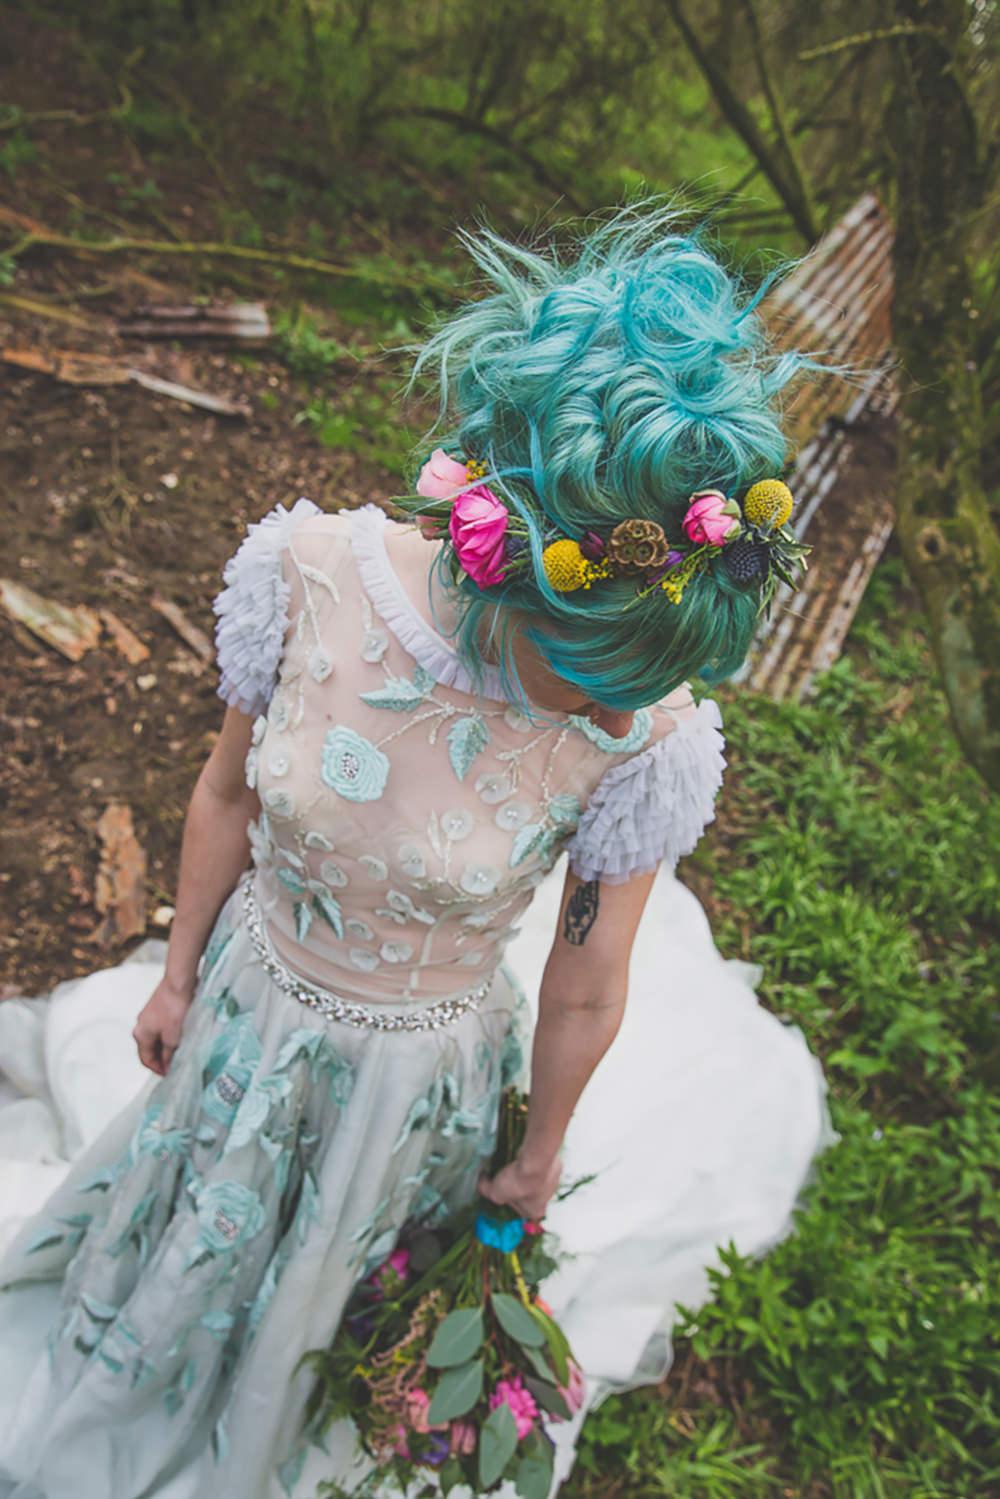 Floral Dress Gown Bride Bridal Embroidered Sheer Blue Rainbow Alternative Woodland Wedding Ideas Nicki Shea Photography